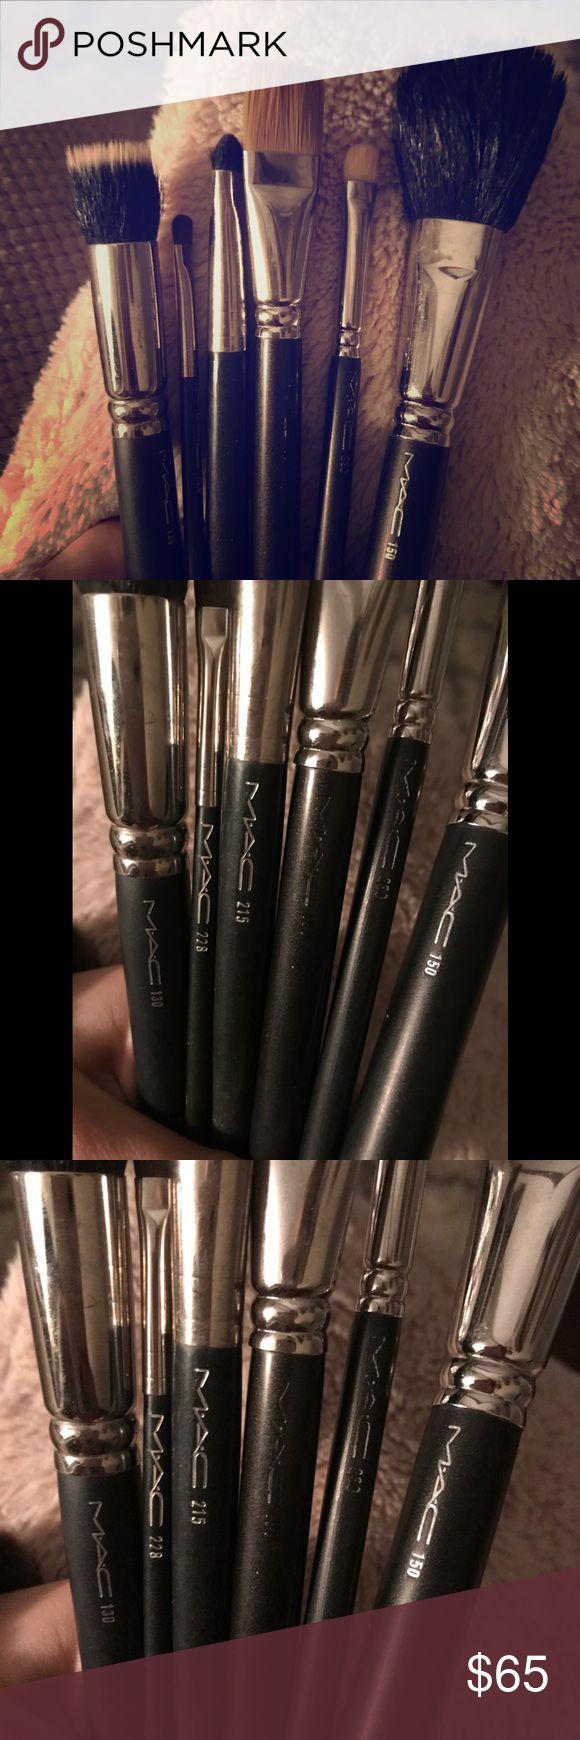 25+ Trending Mac Makeup Brushes Ideas On Pinterest